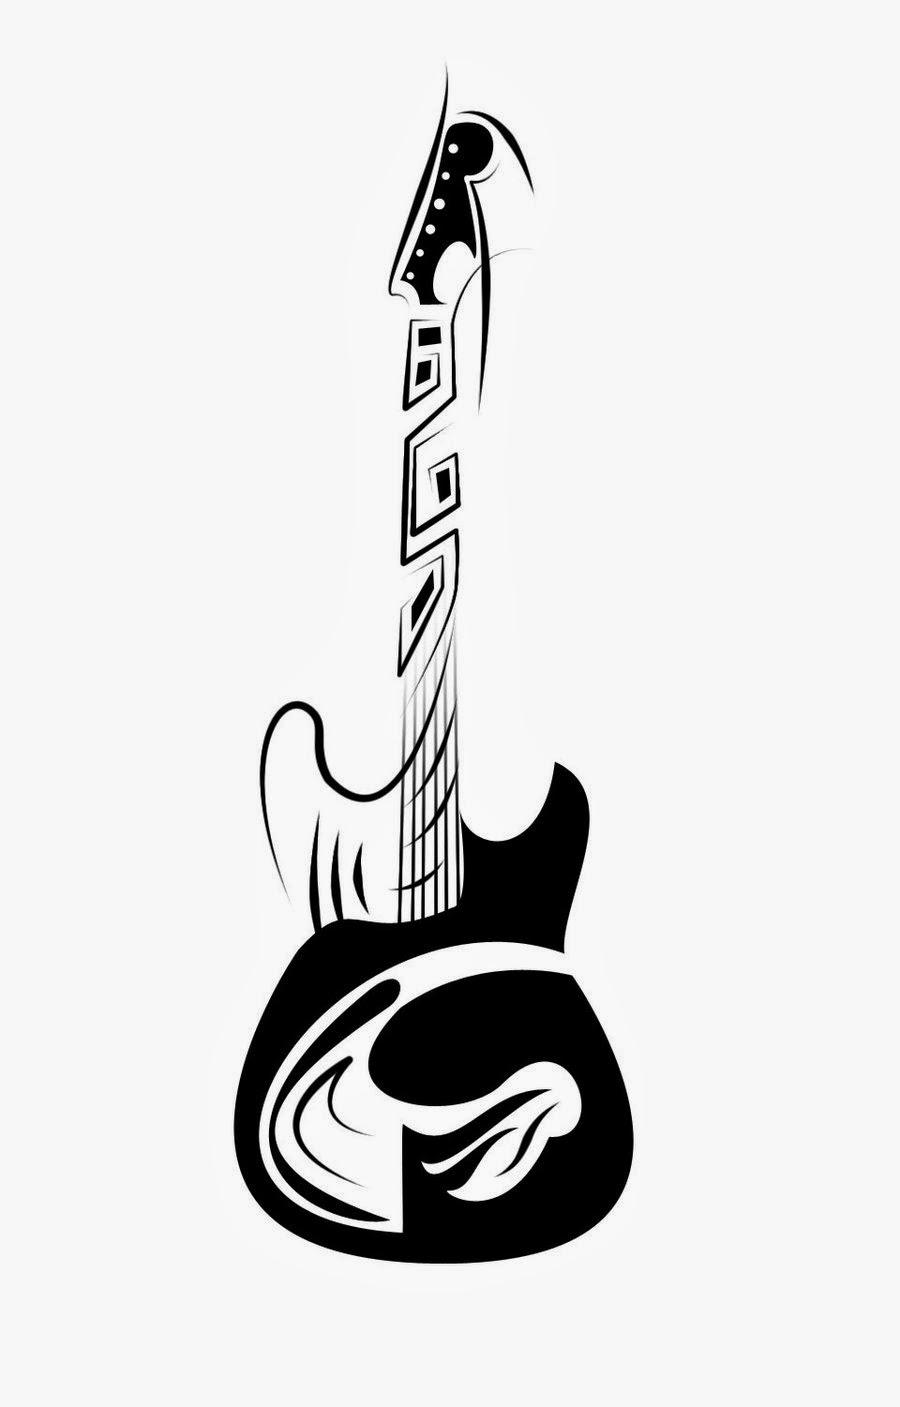 Tribal guitar tattoo designsAcoustic Guitar Drawing Tattoo